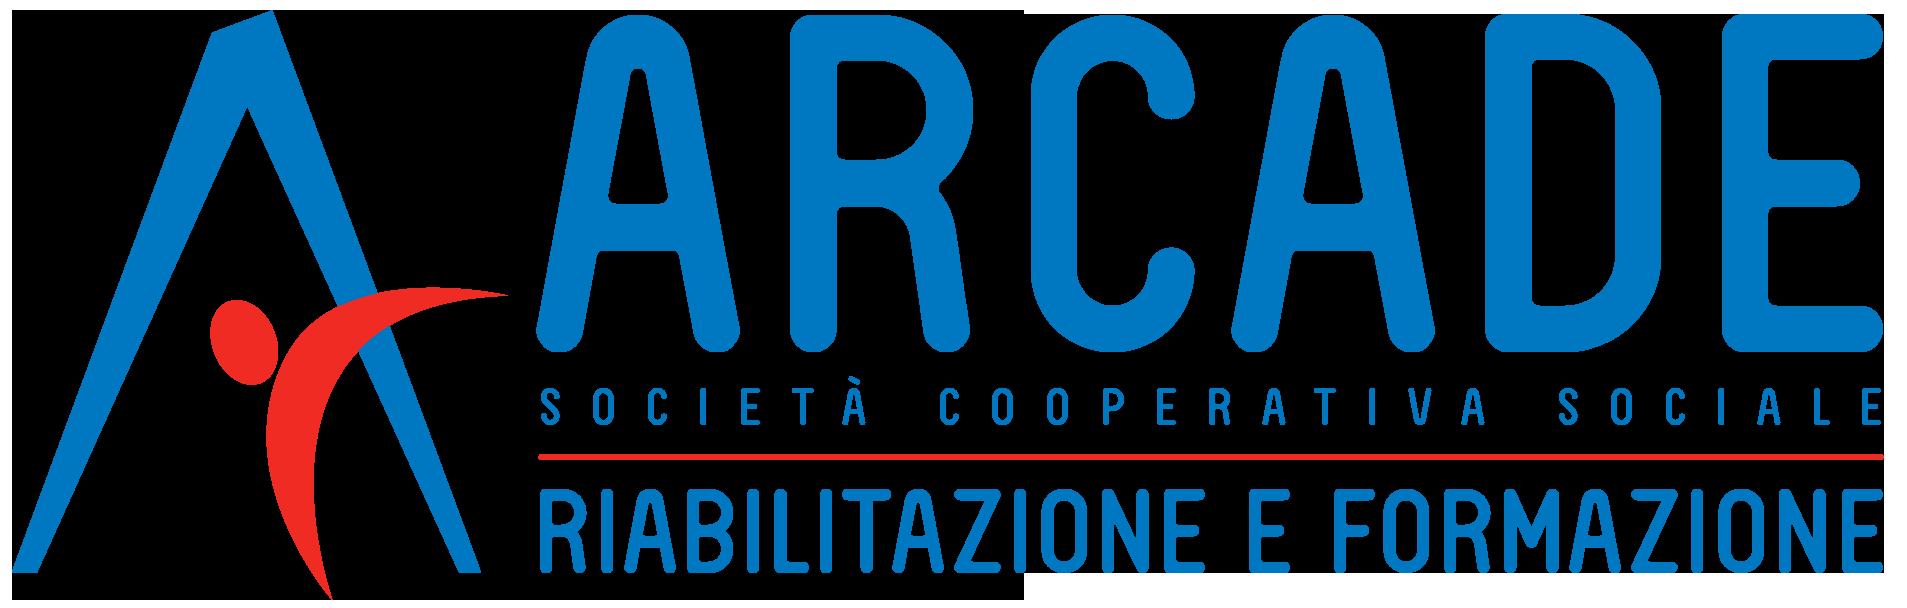 ABcommunication_Portfolio_logo_Arcade